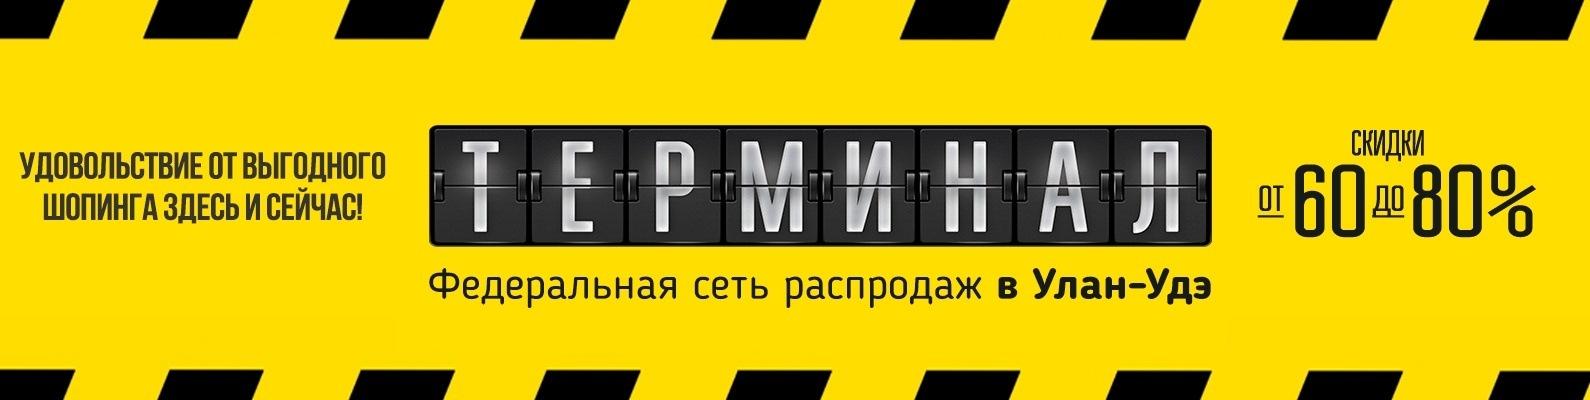 ce85acaa7b31 Терминал. Распродажи в Улан-Удэ   ВКонтакте